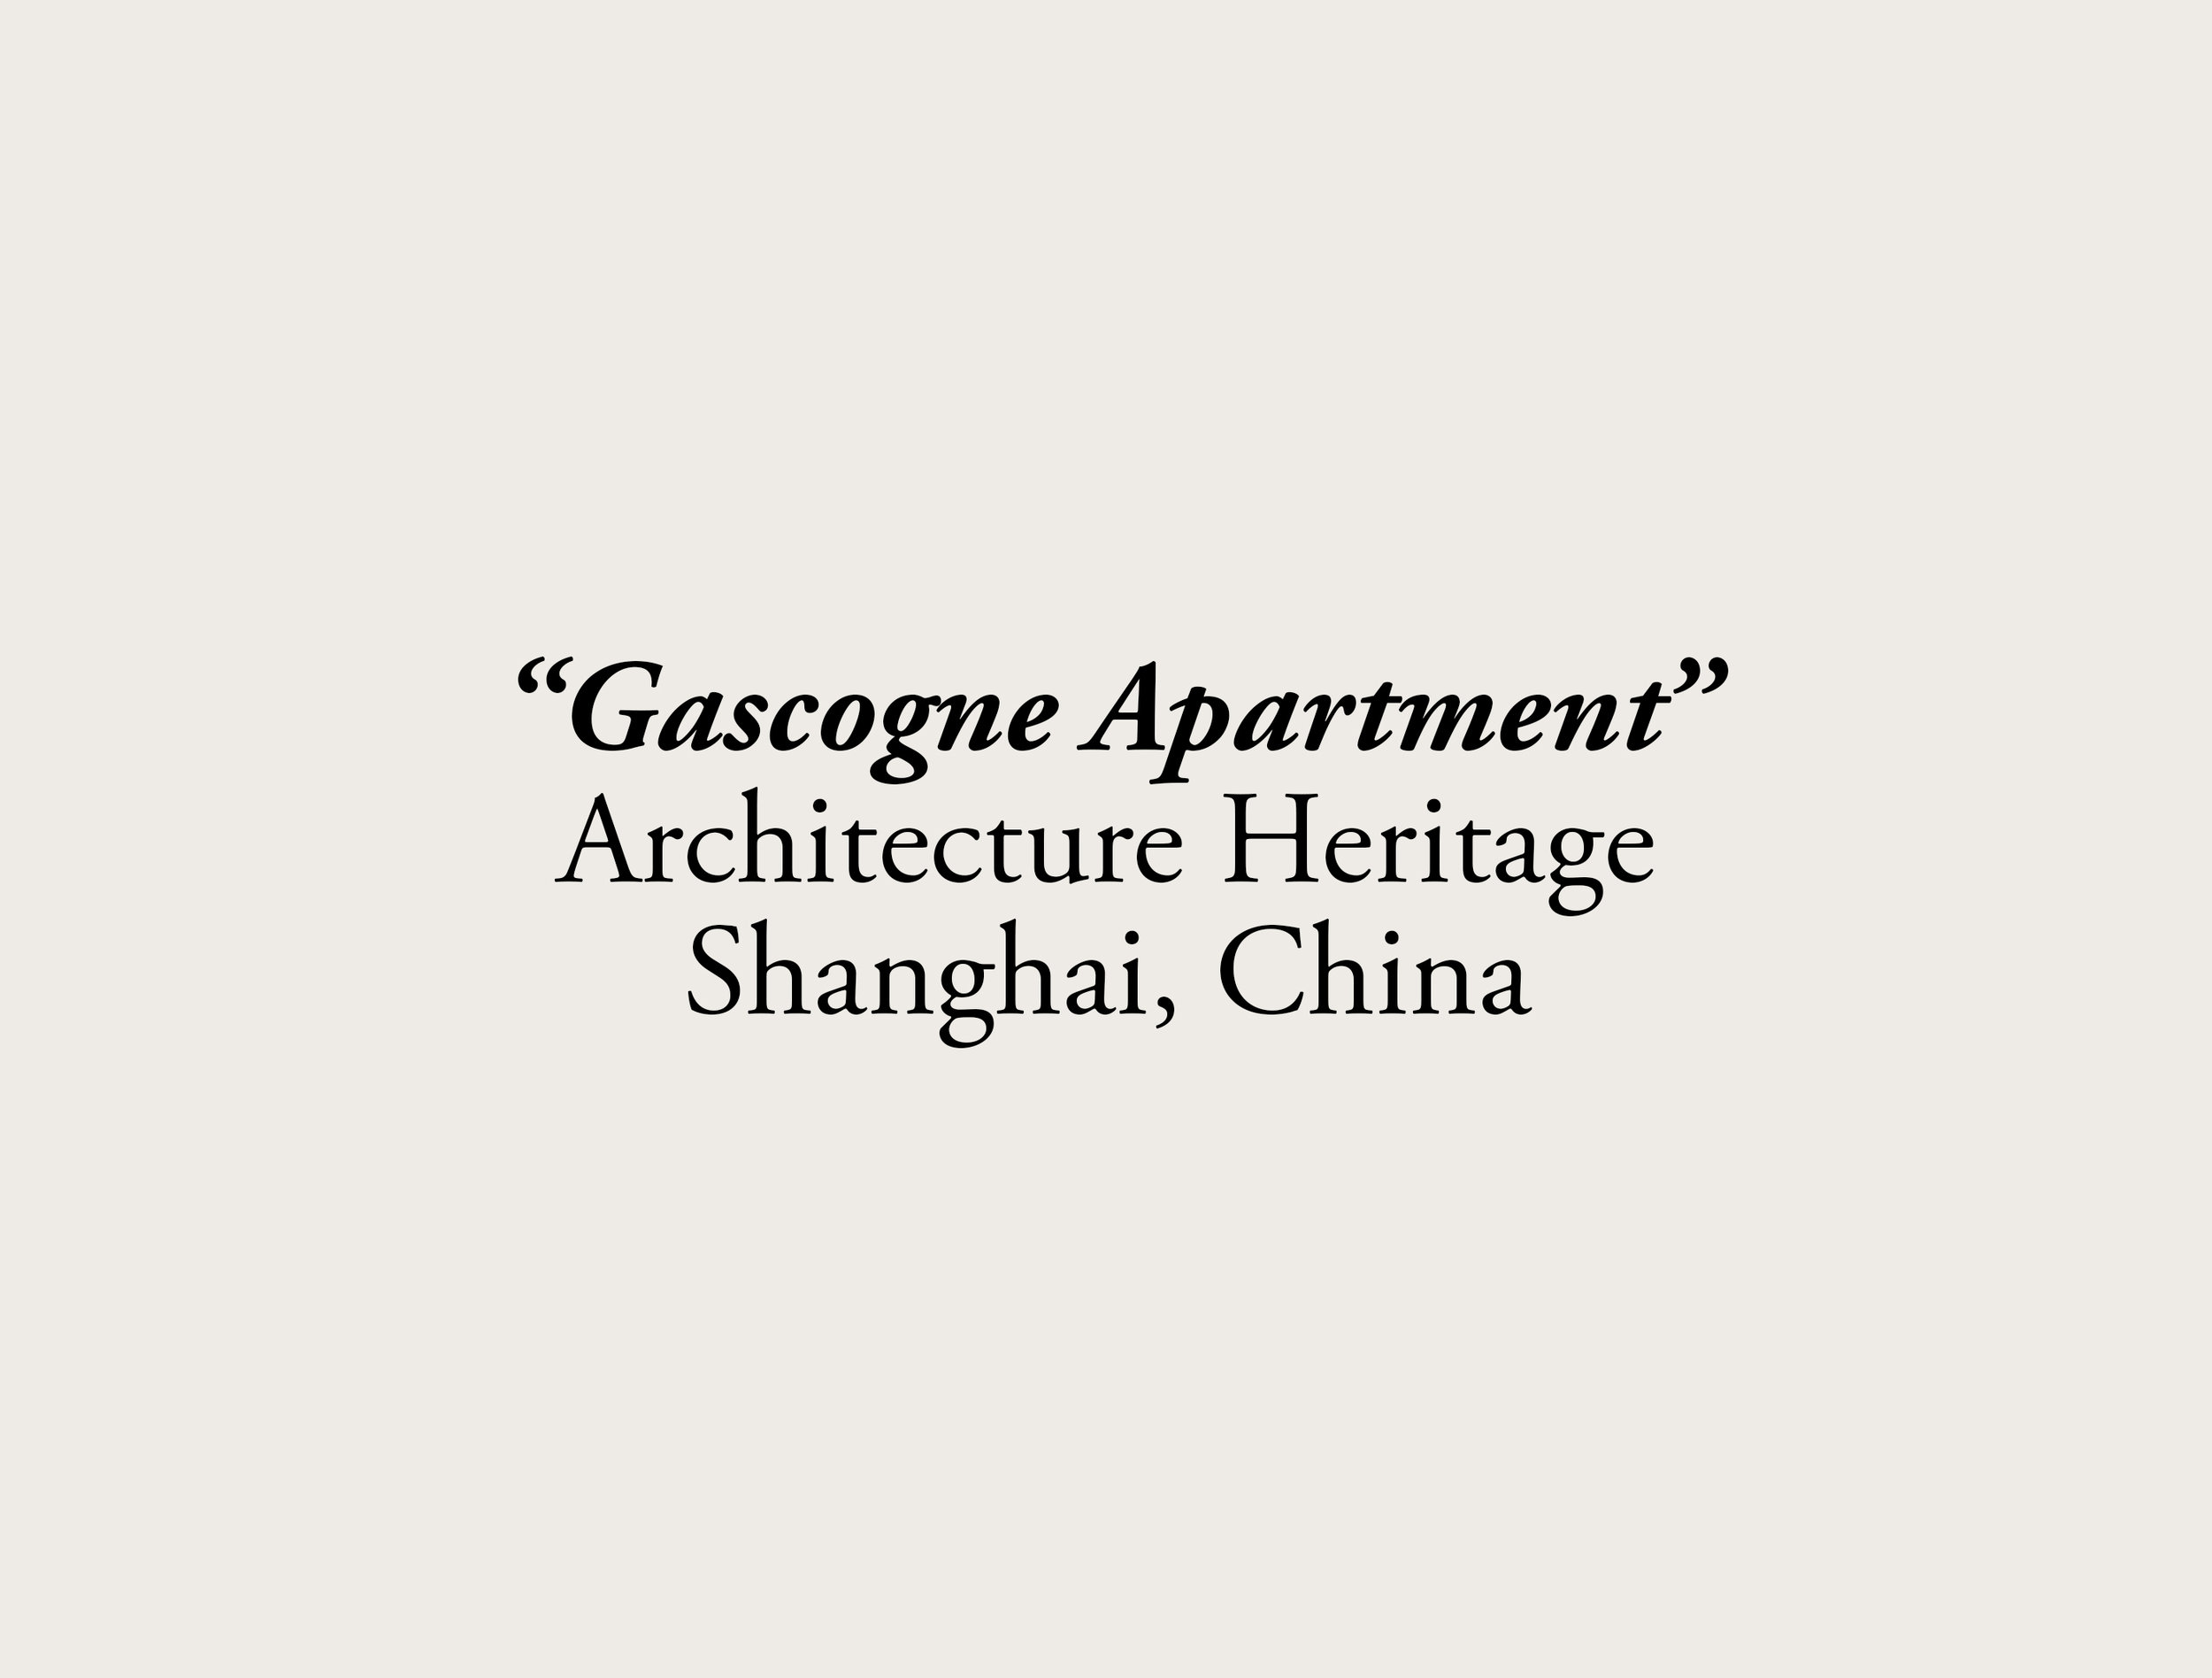 raams-architecture-design-studio-gascogne-apartment-house-shanghai-china-01.jpg